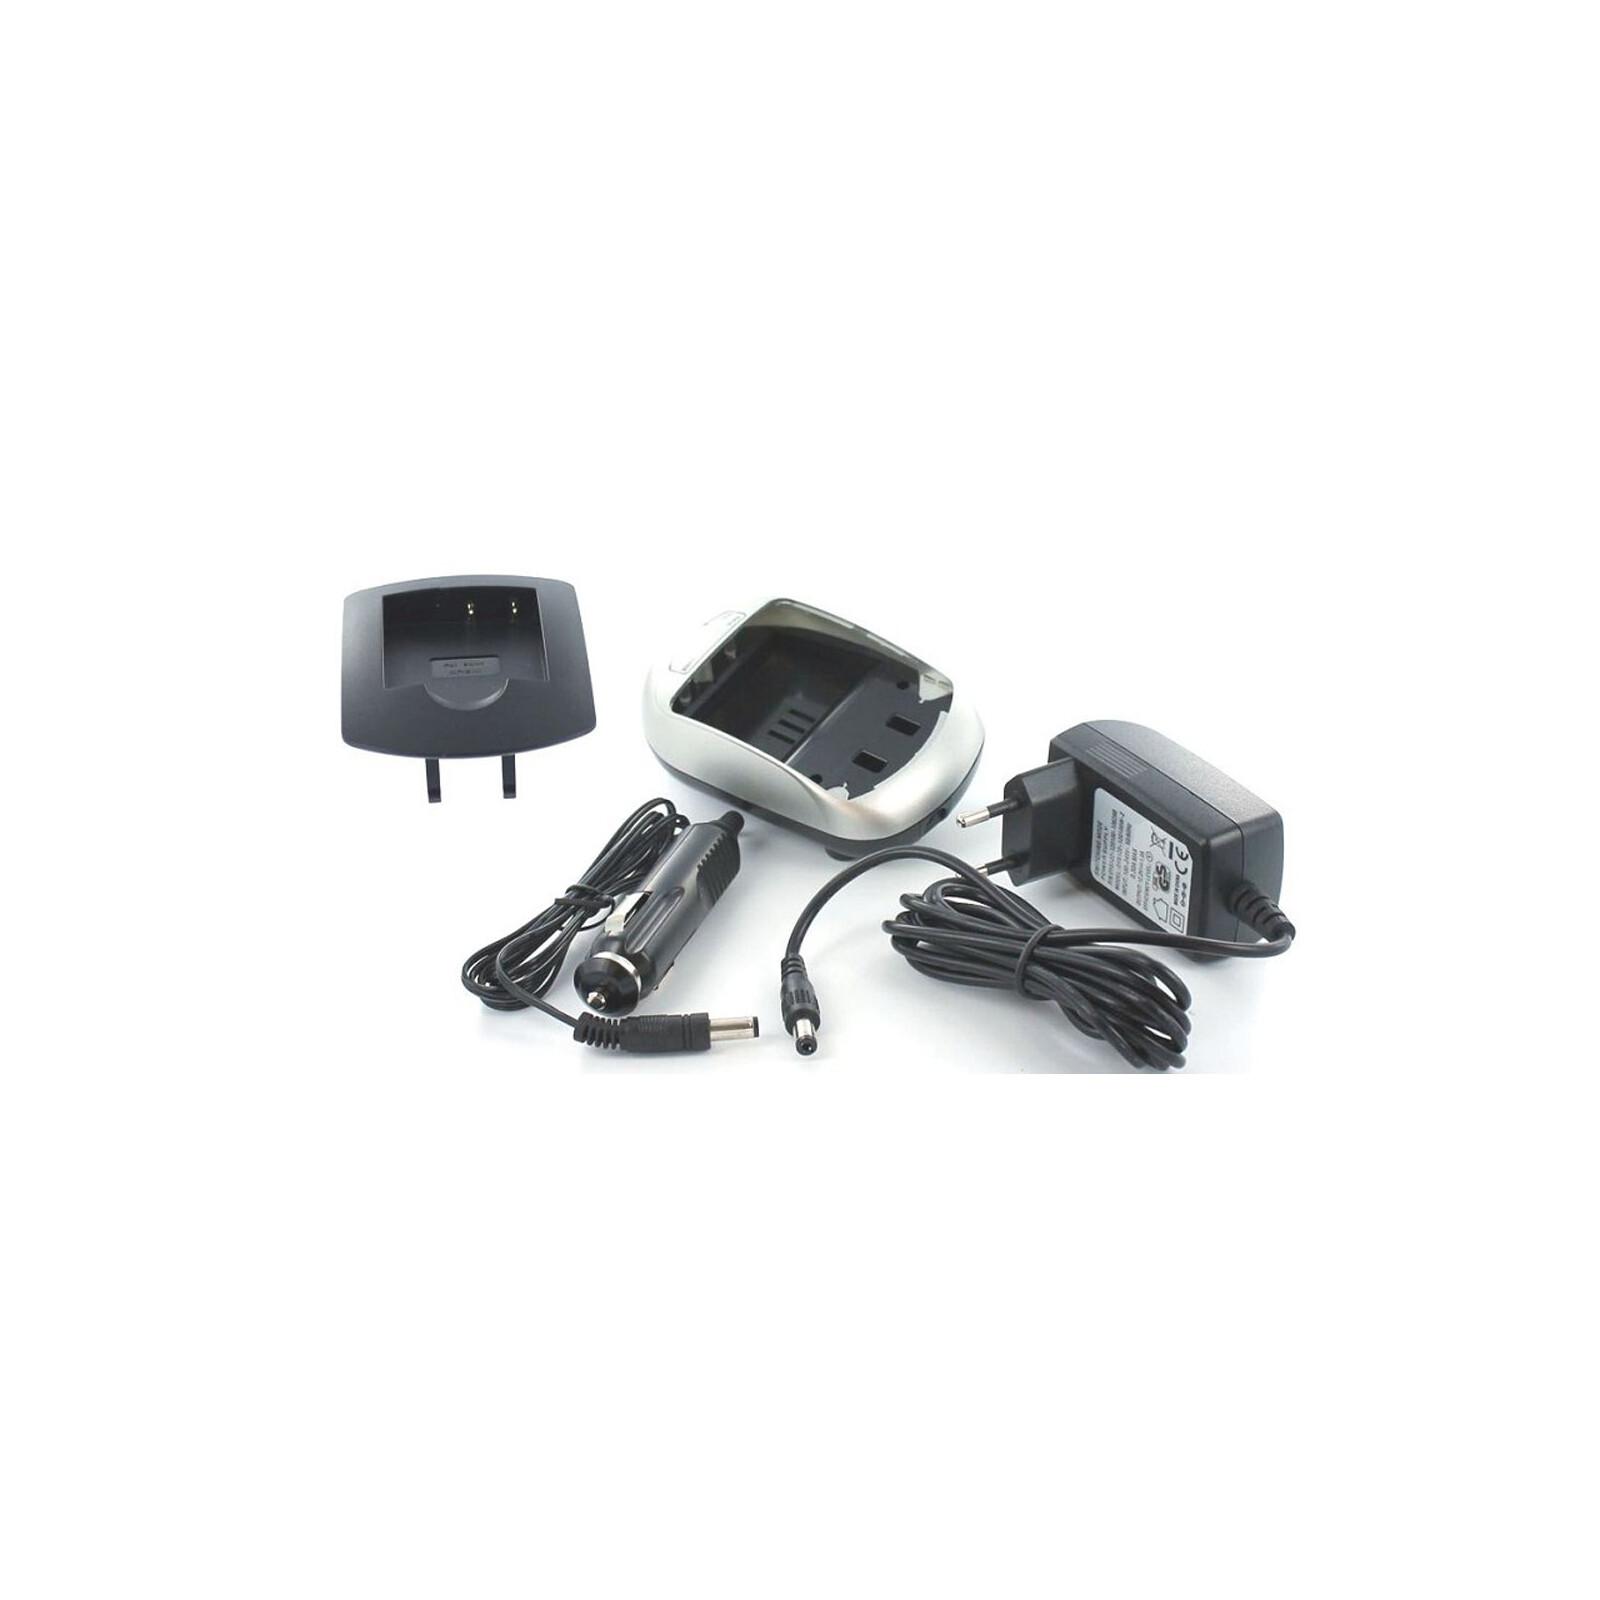 AGI 18201 Ladegerät Sony DSC-WX220